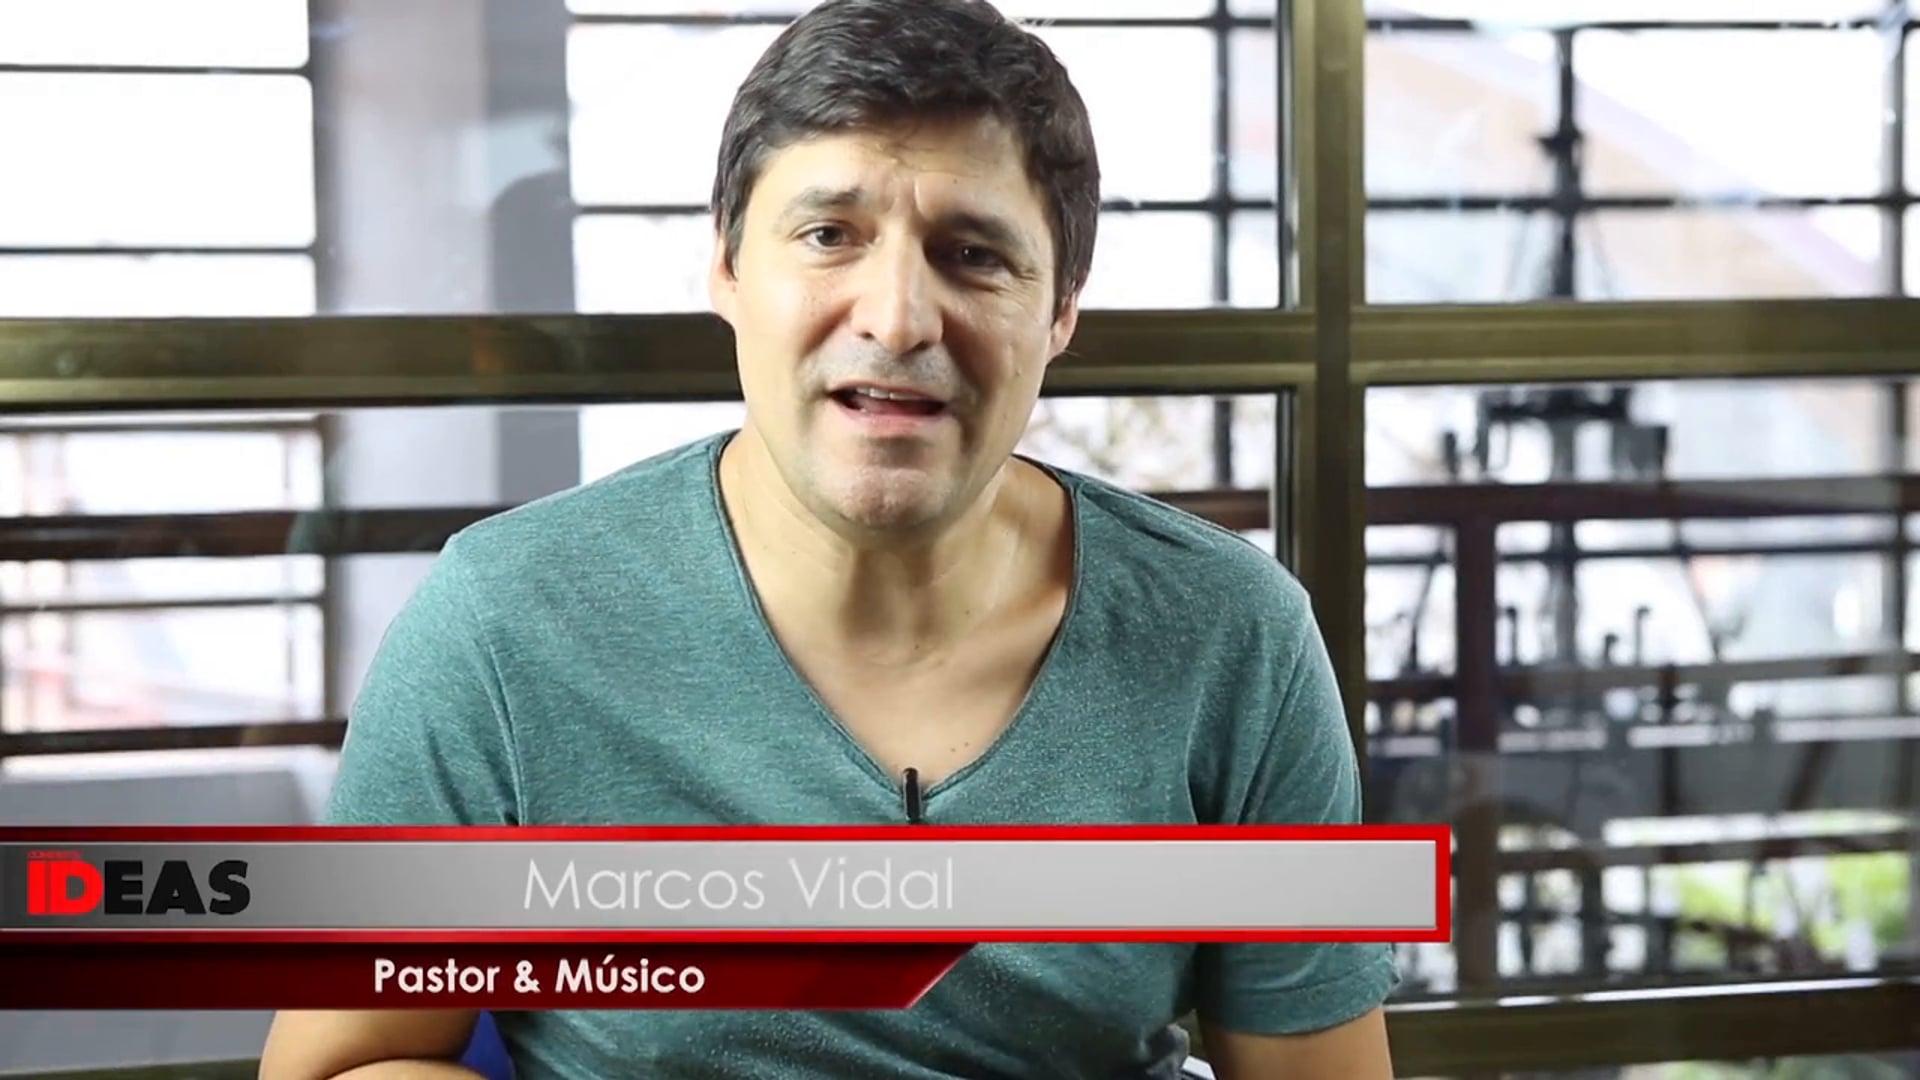 IDEAS. Marcos Vidal. Liderazgo en base a carácter.